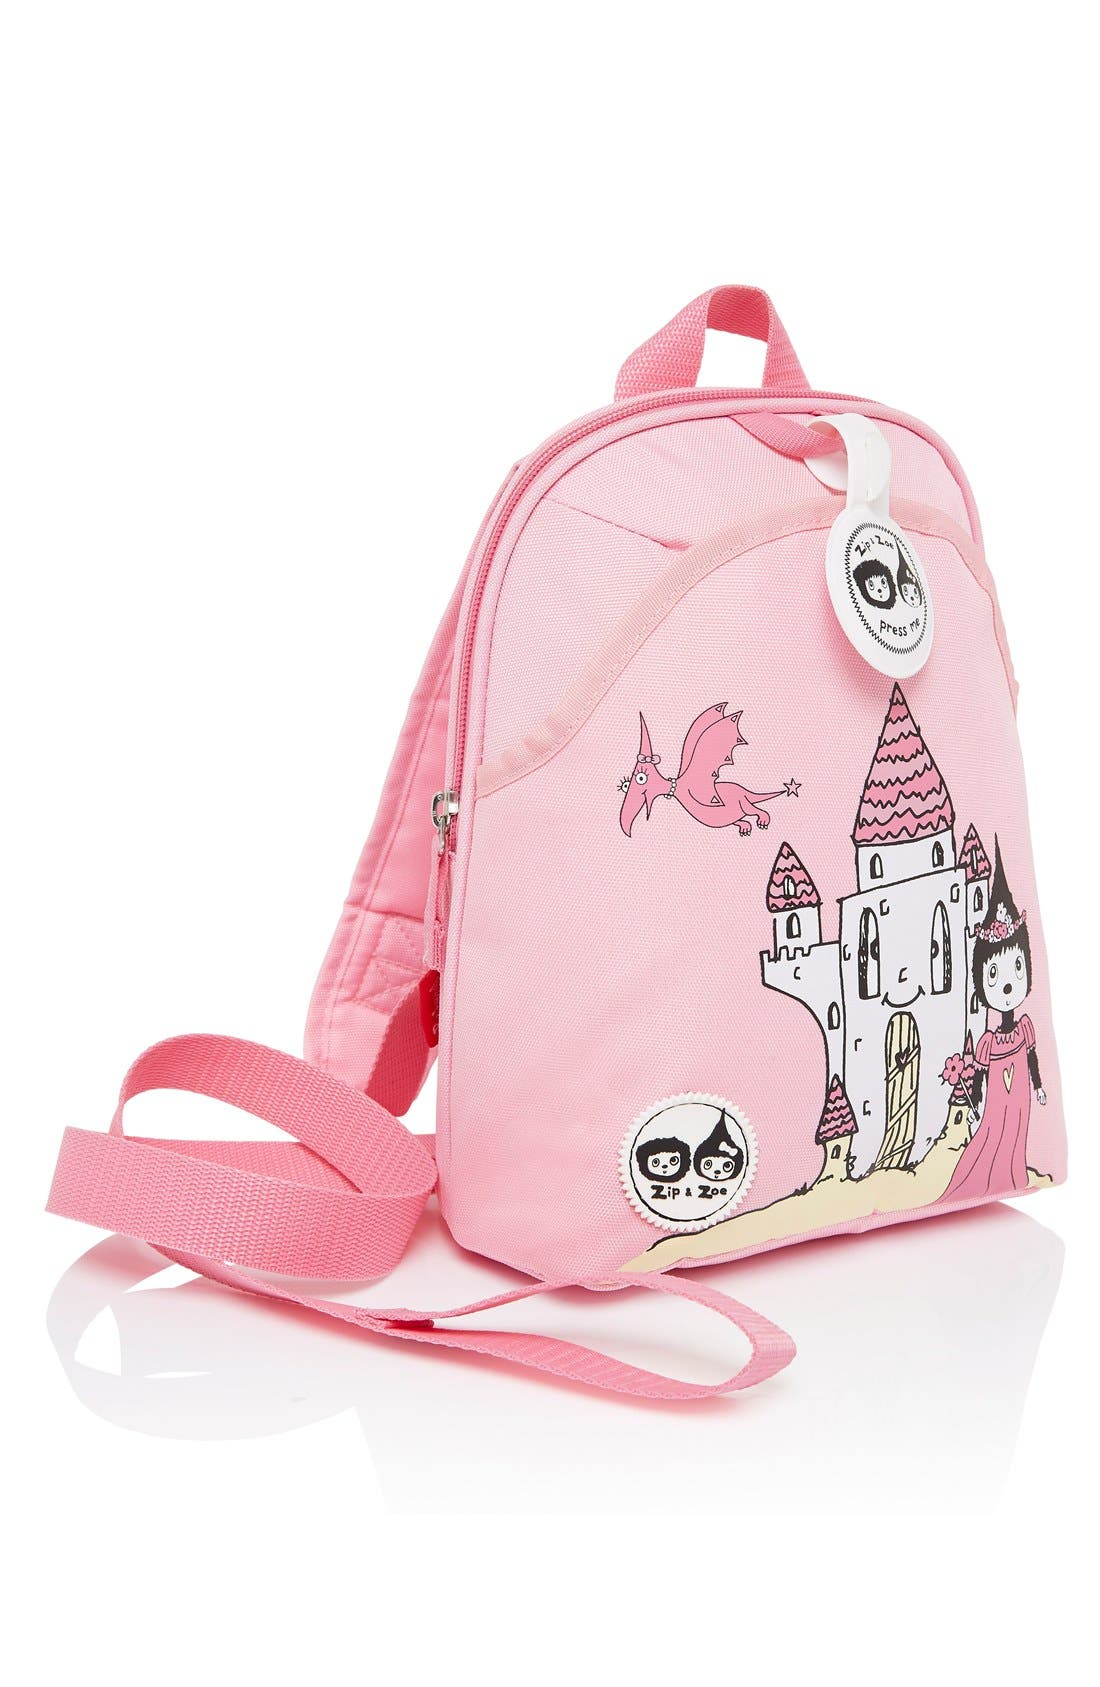 Graphic Mini Backpack,                             Alternate thumbnail 6, color,                             DAISY DRAGON CASTLE